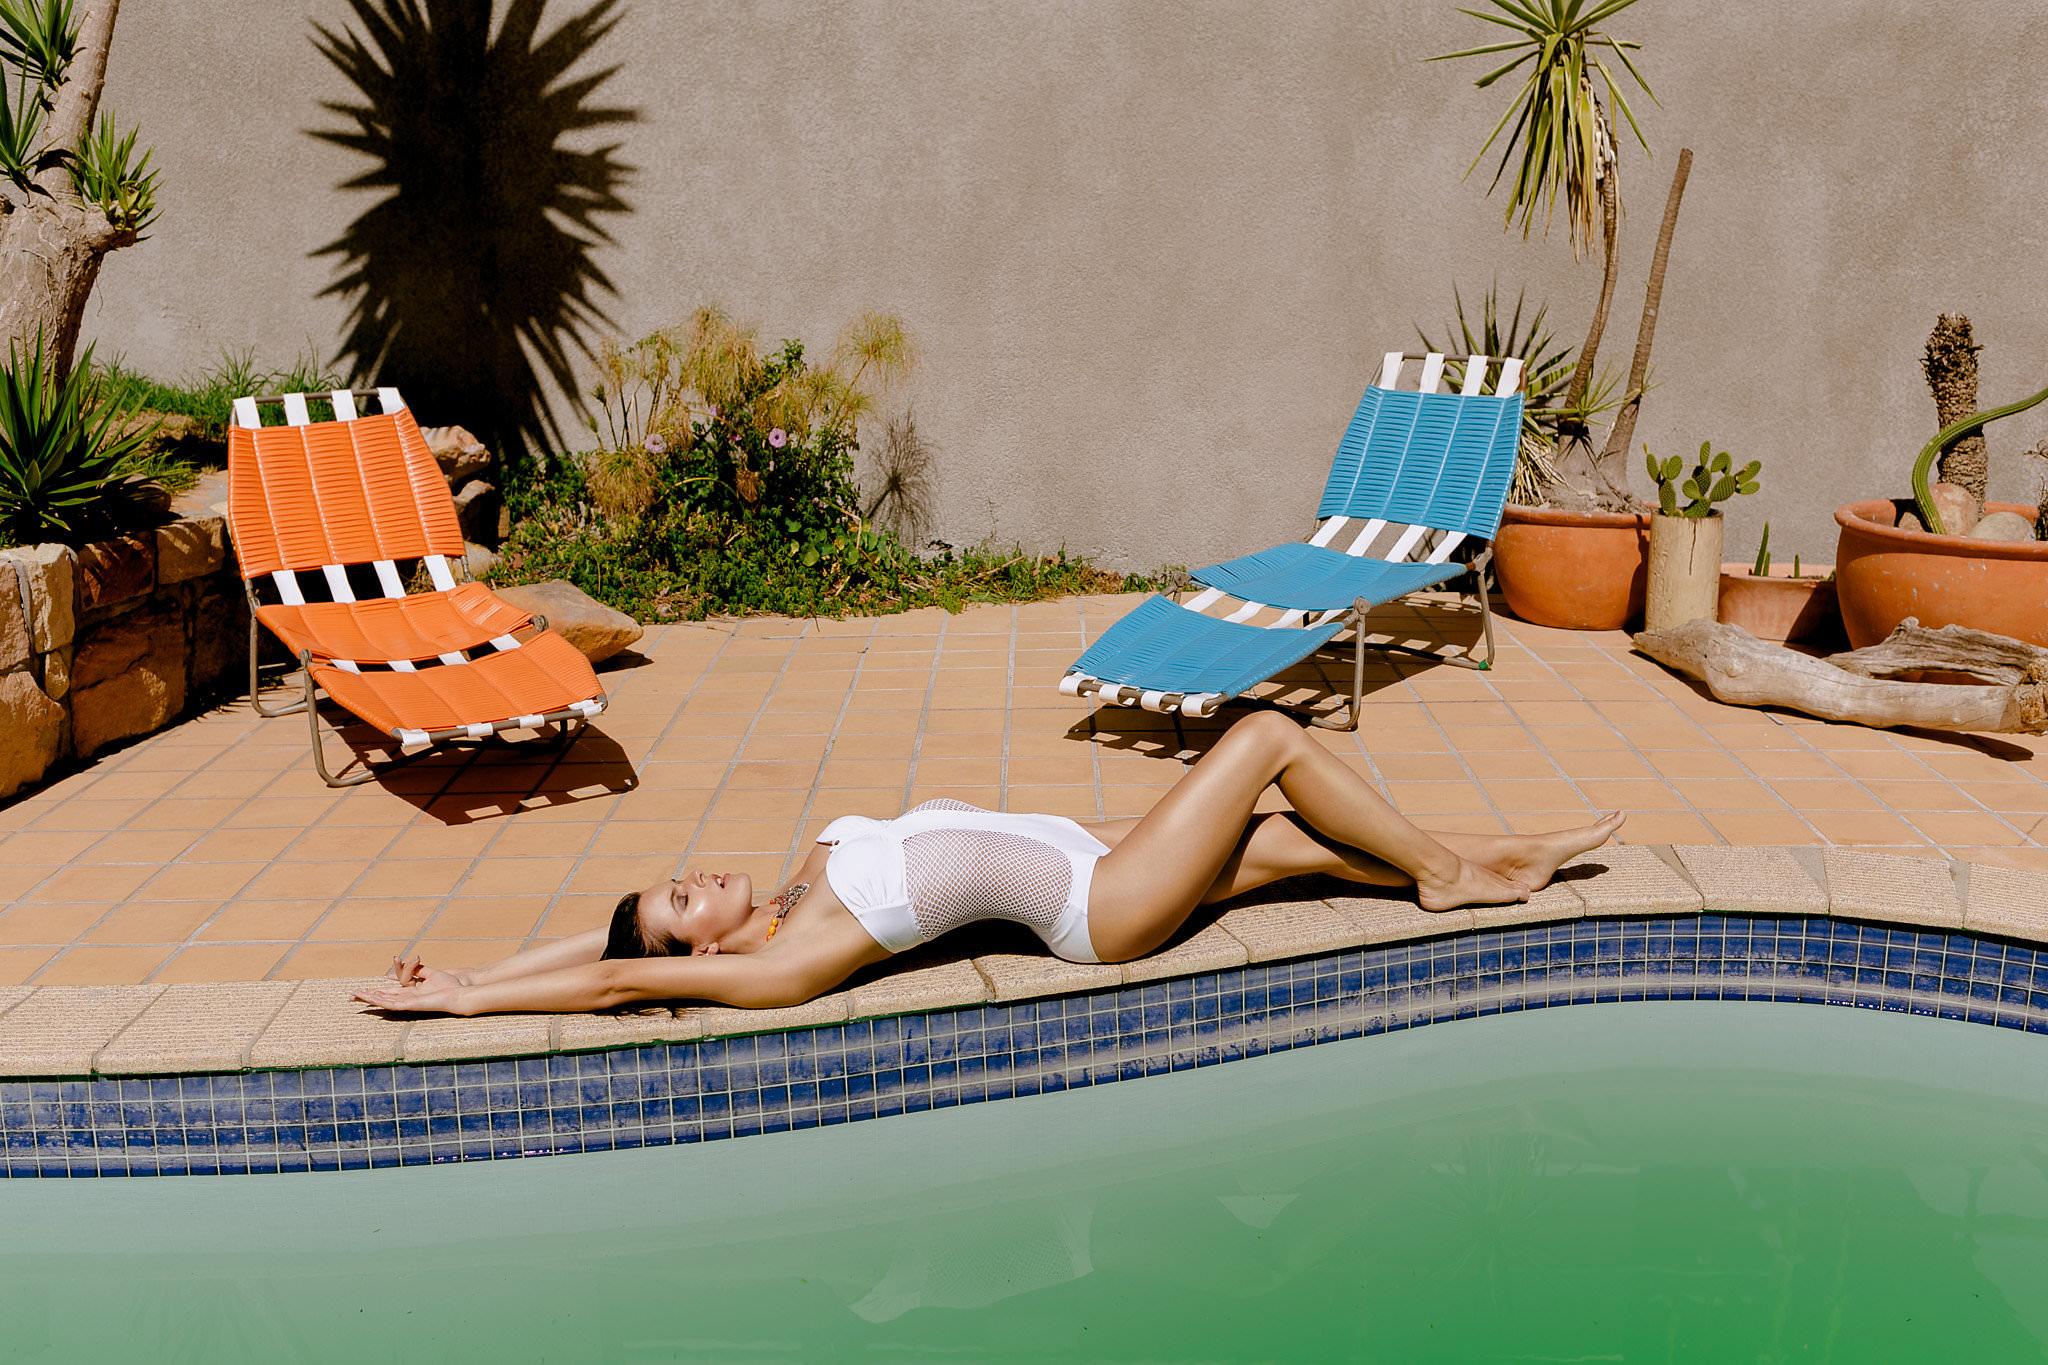 Fashion Shoot Swimwear in Camps Bay, Cape Town. photo by Farina Deutschmann